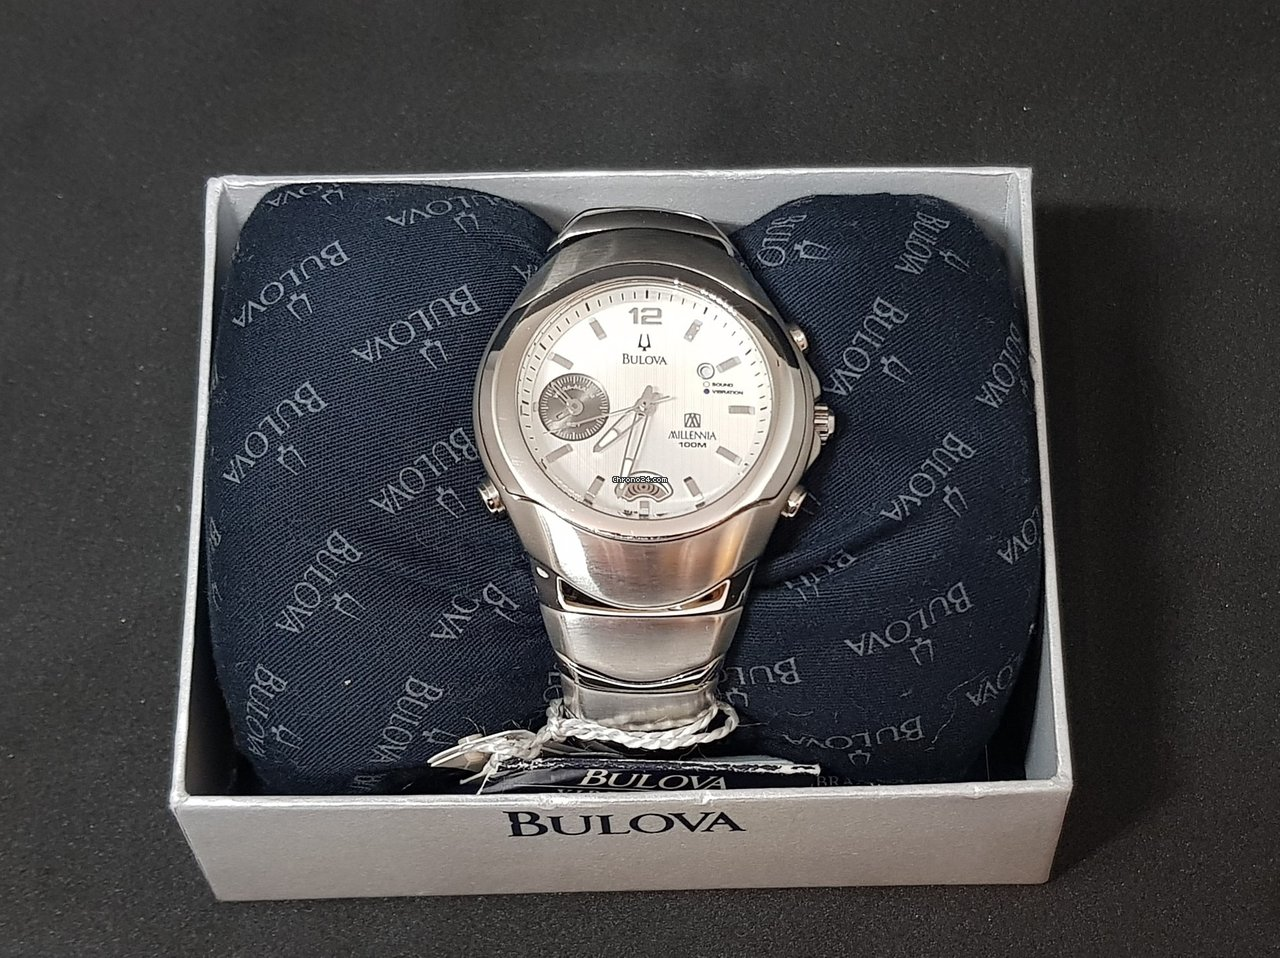 43a76eb20bb4 Relojes Bulova - Precios de todos los relojes Bulova en Chrono24